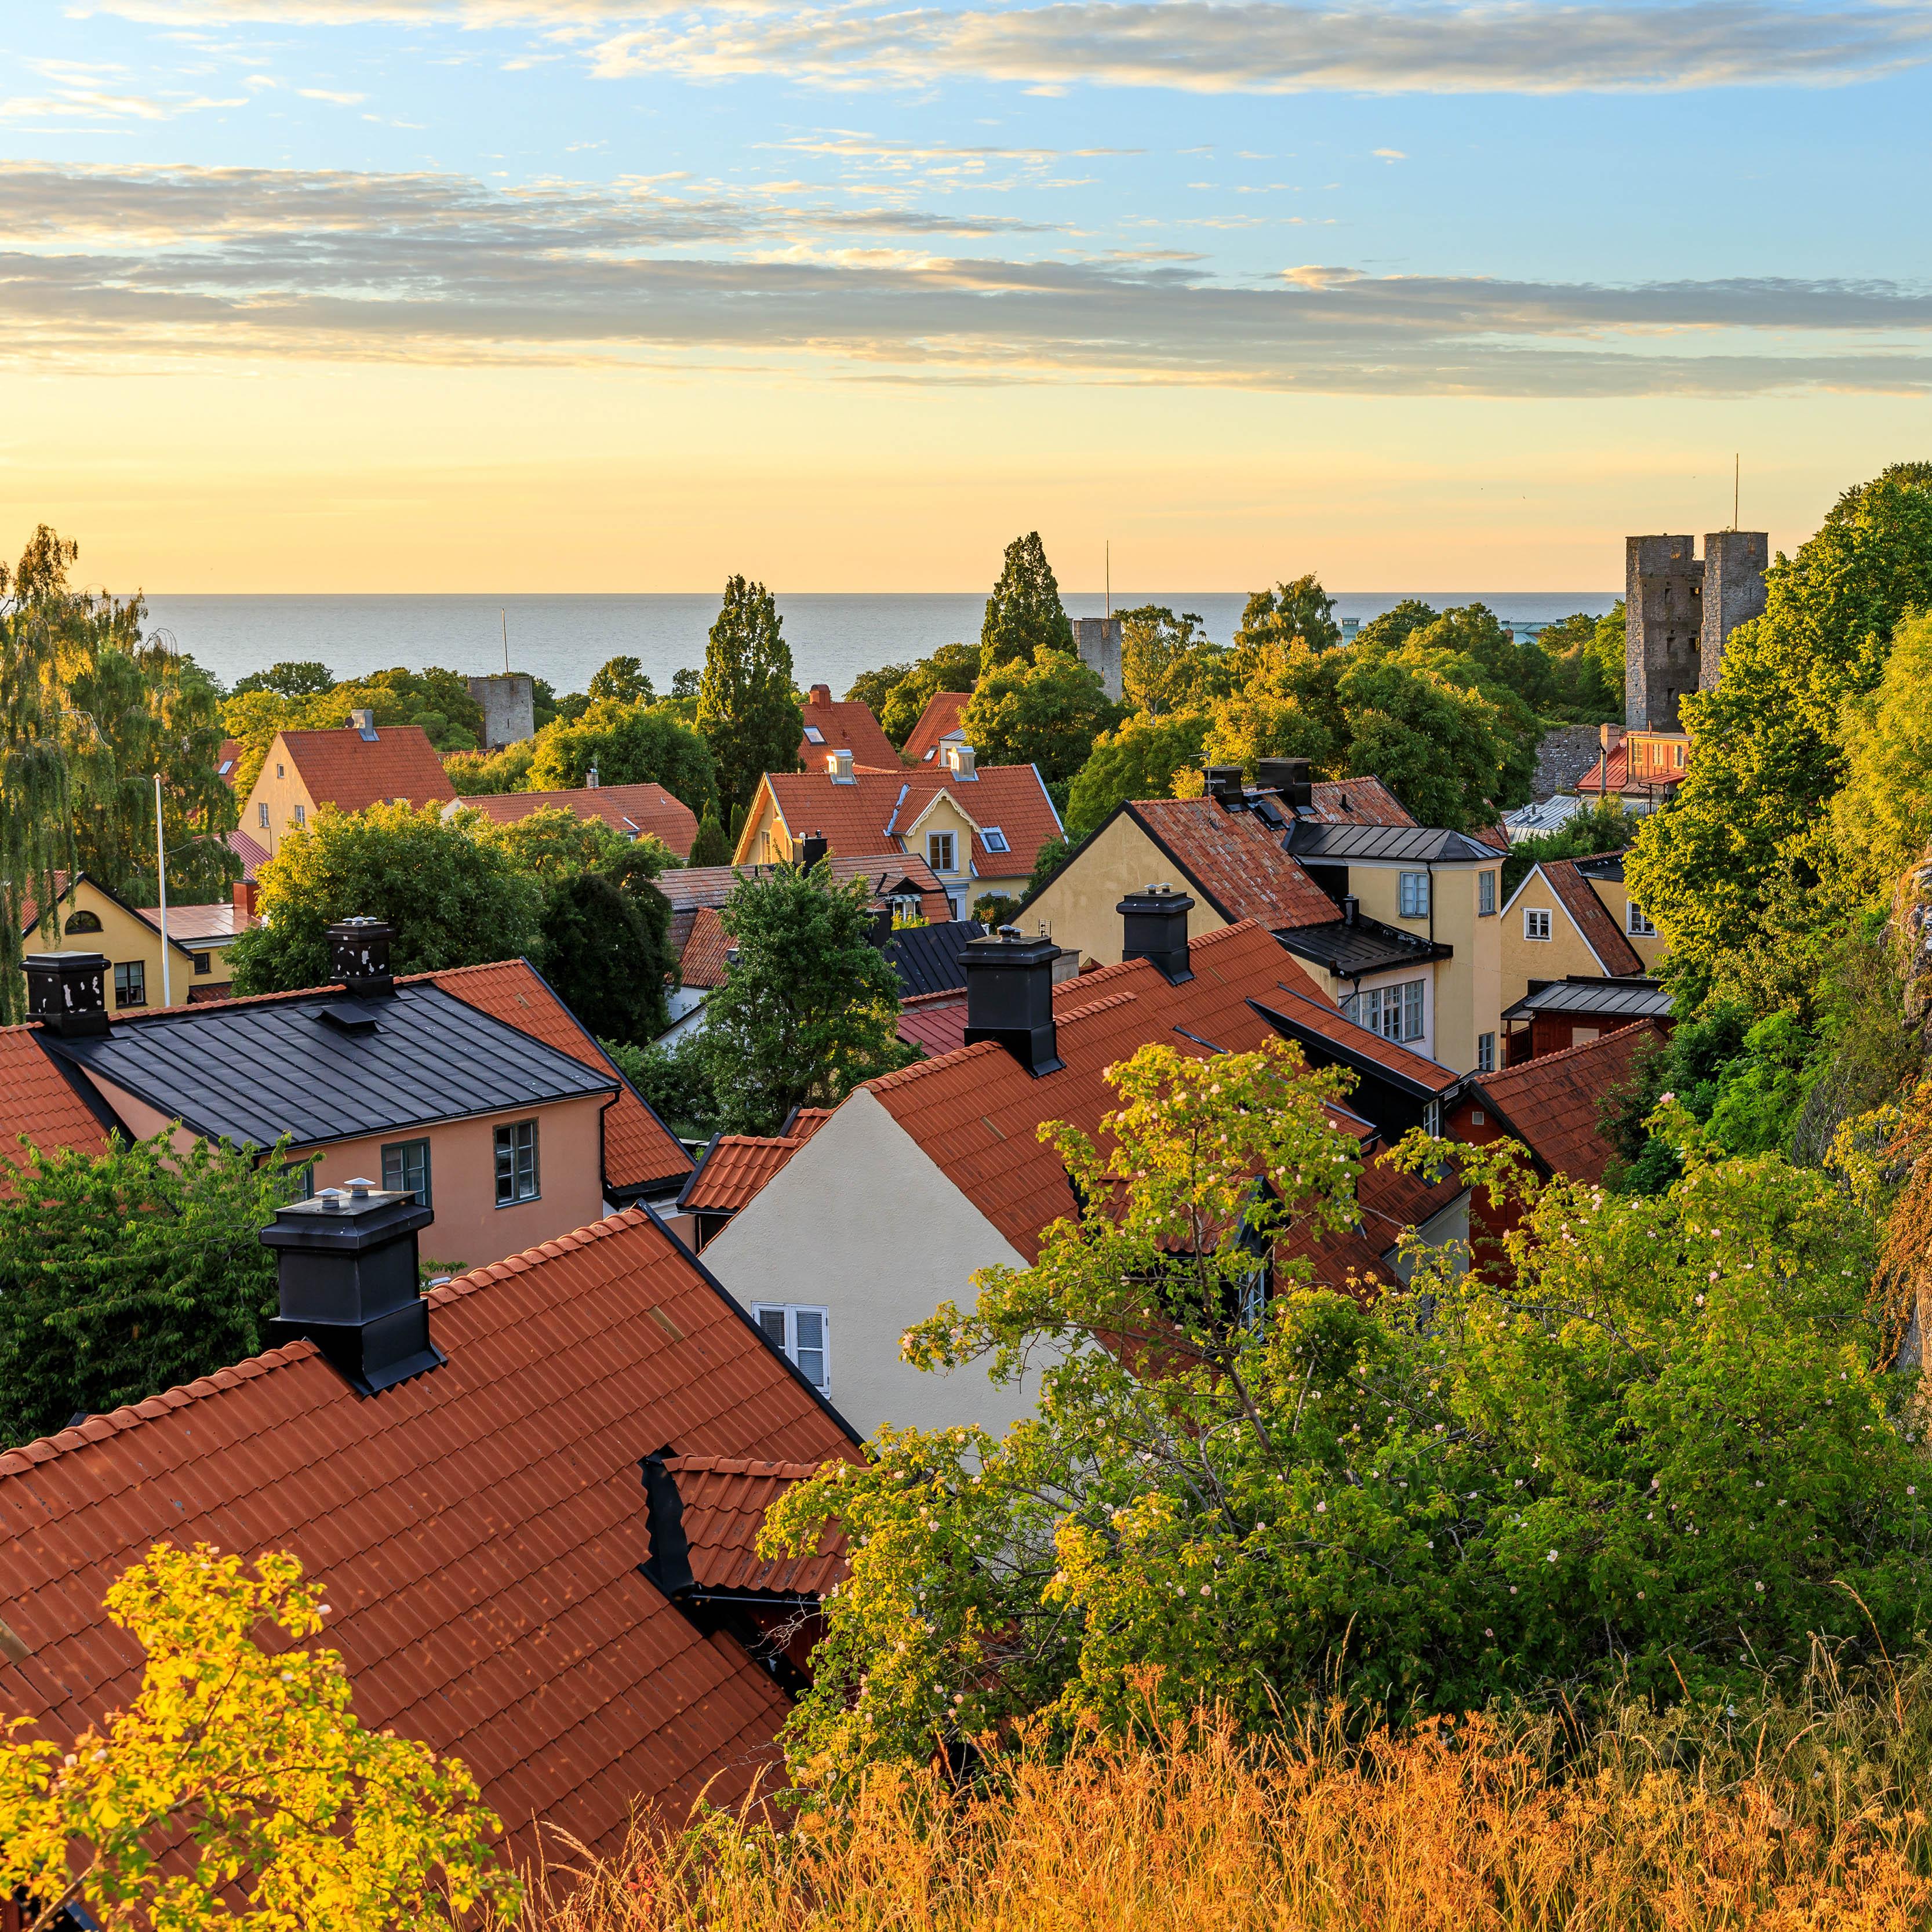 Visby, walking tour